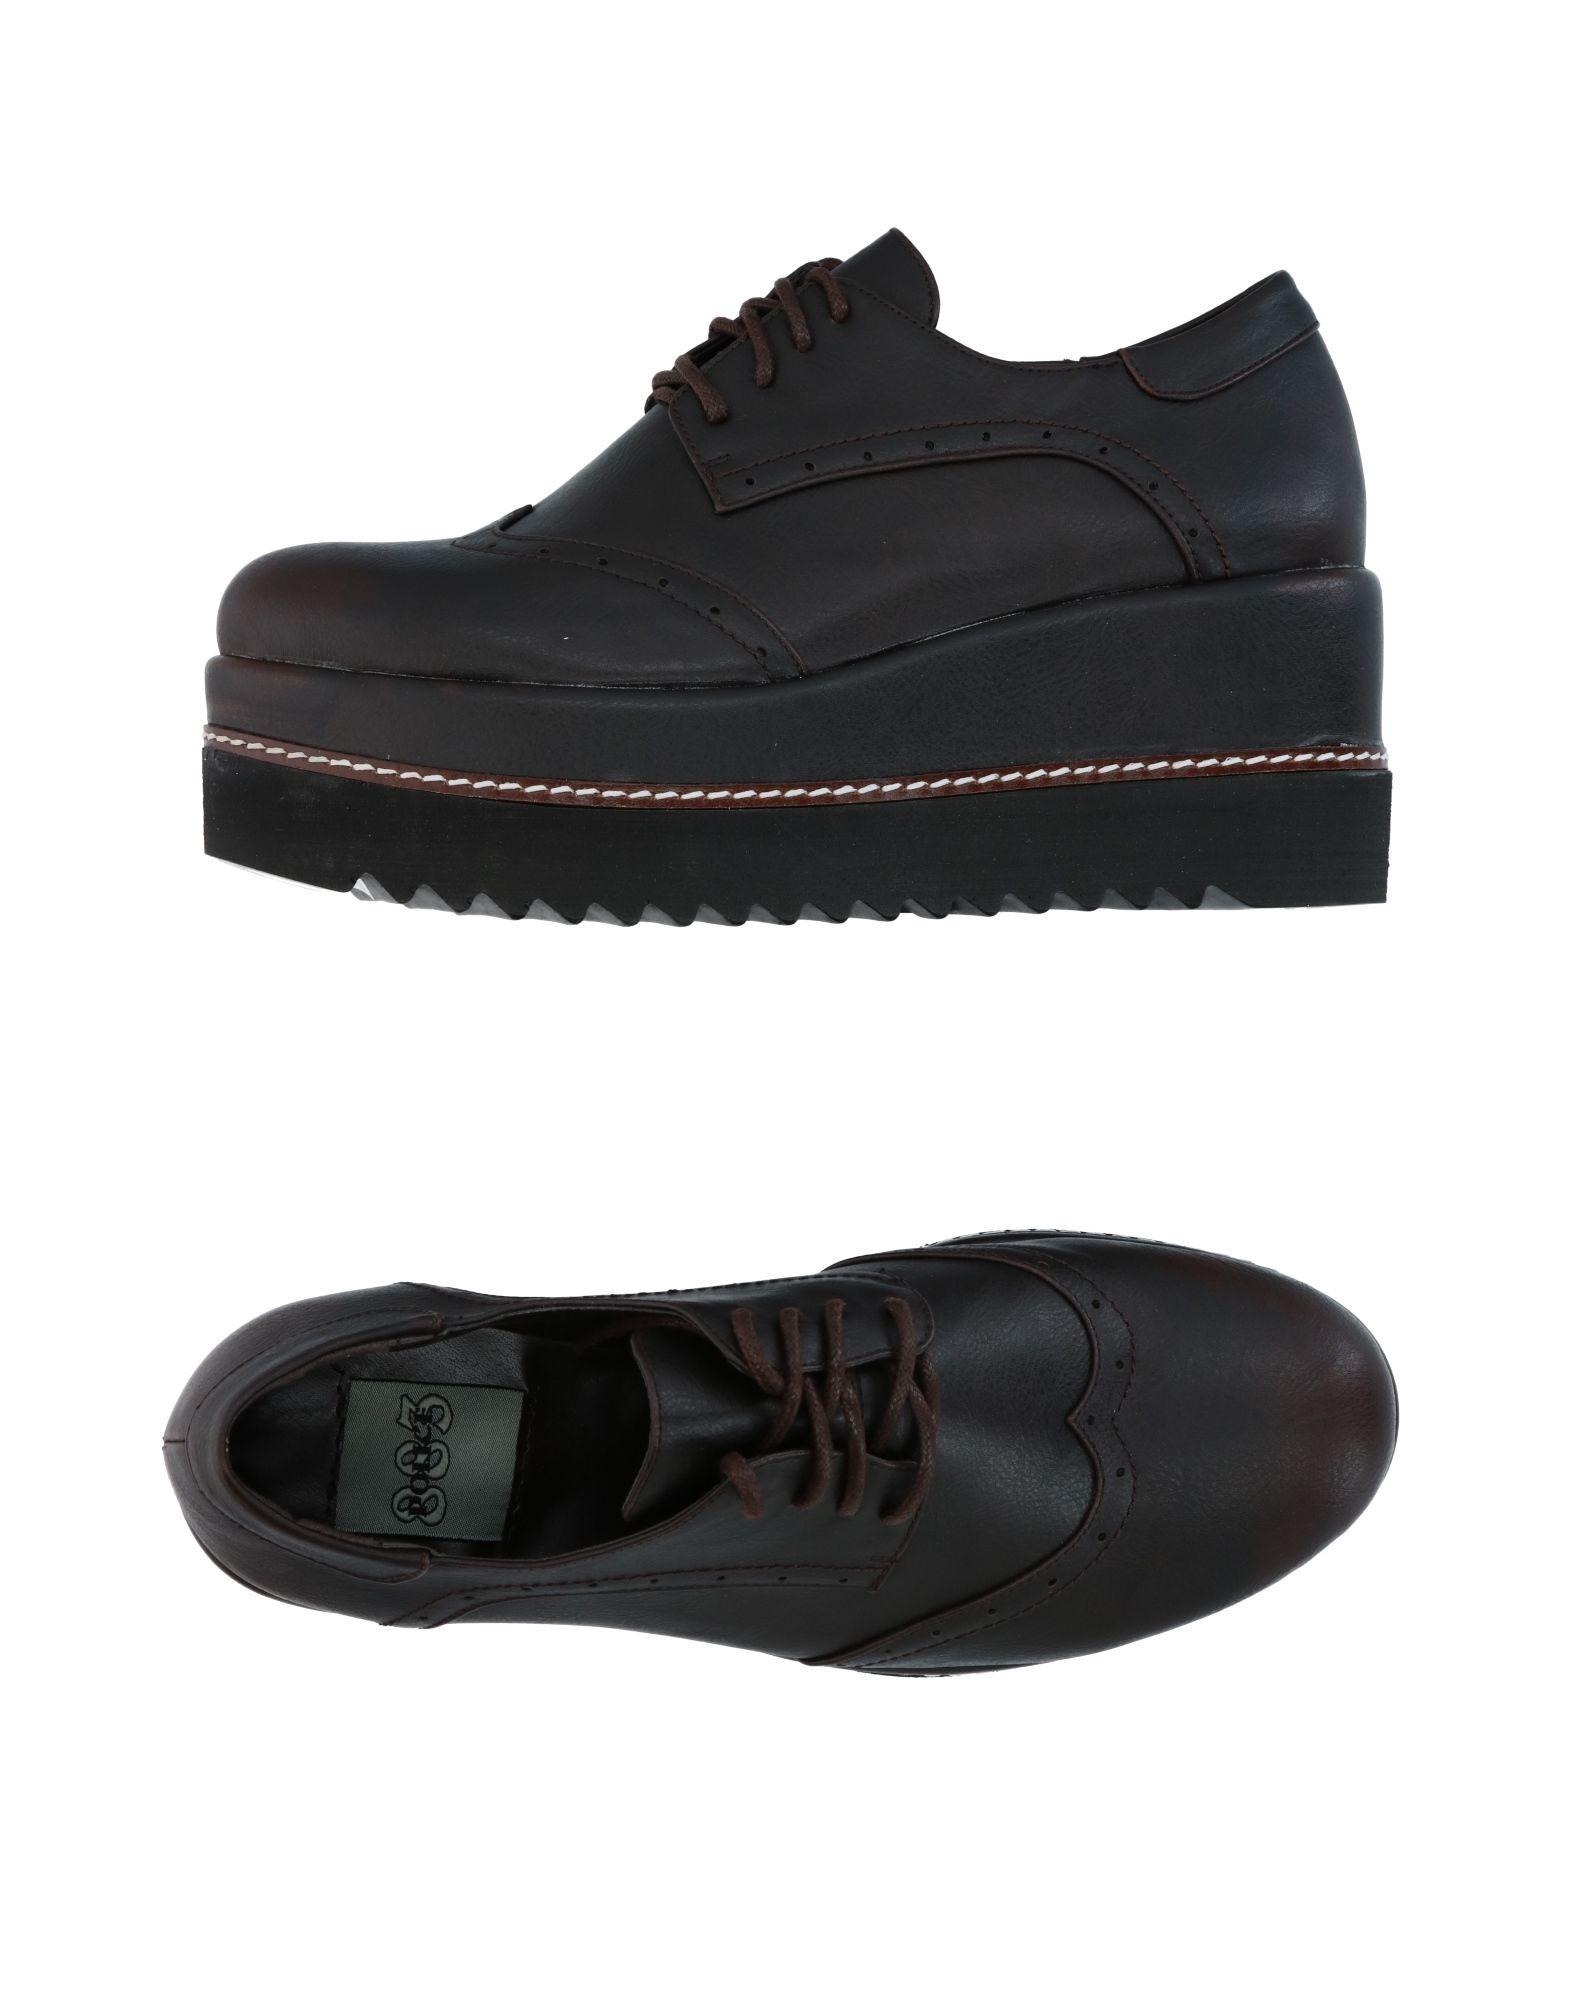 POLICE 883 Обувь на шнурках первый внутри обувь обувь обувь обувь обувь обувь обувь обувь обувь 8a2549 мужская армия green 40 метров